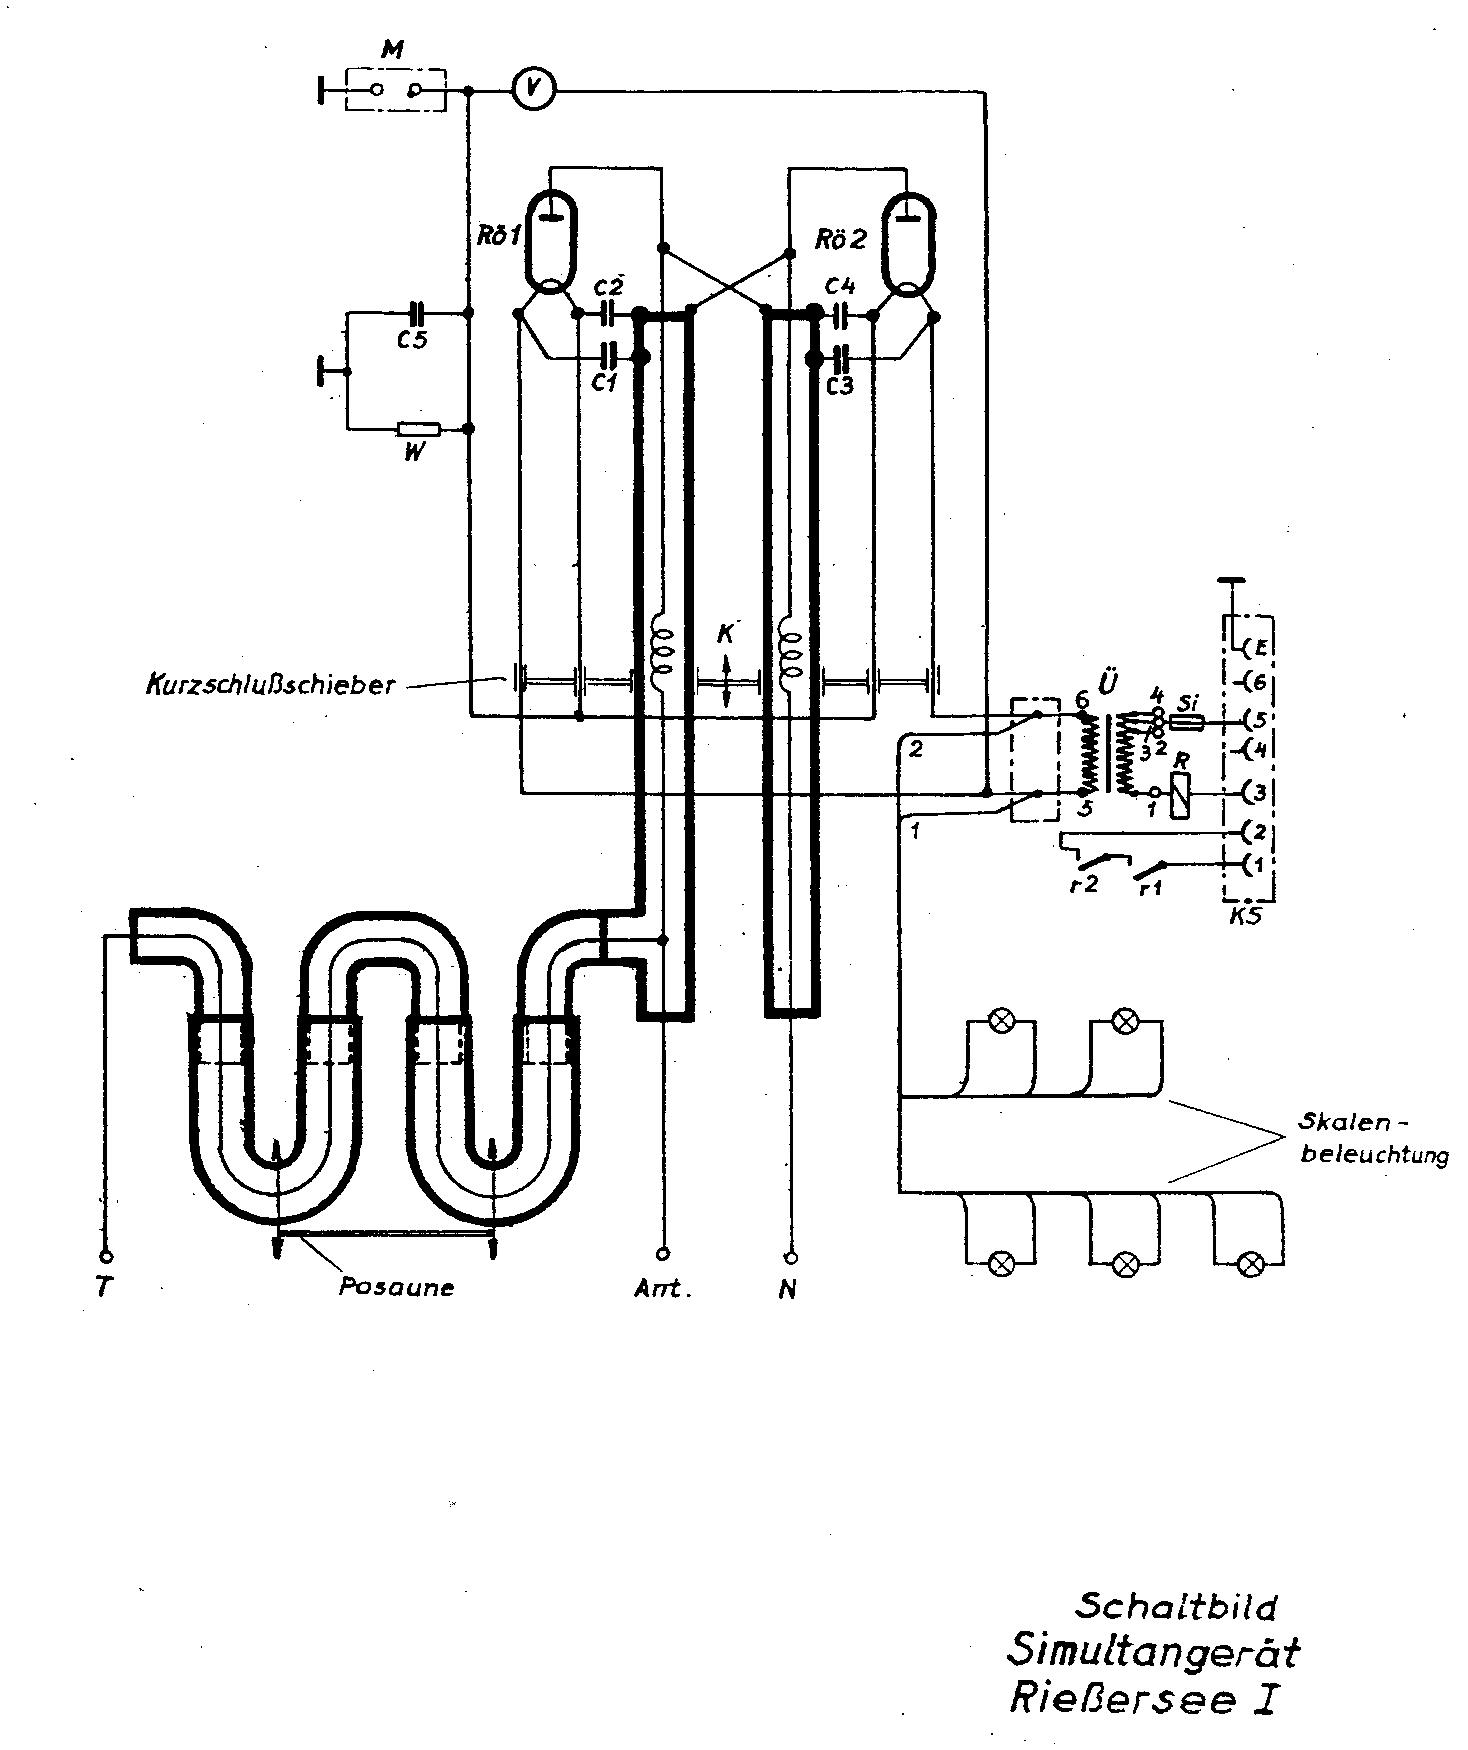 wassermann survey